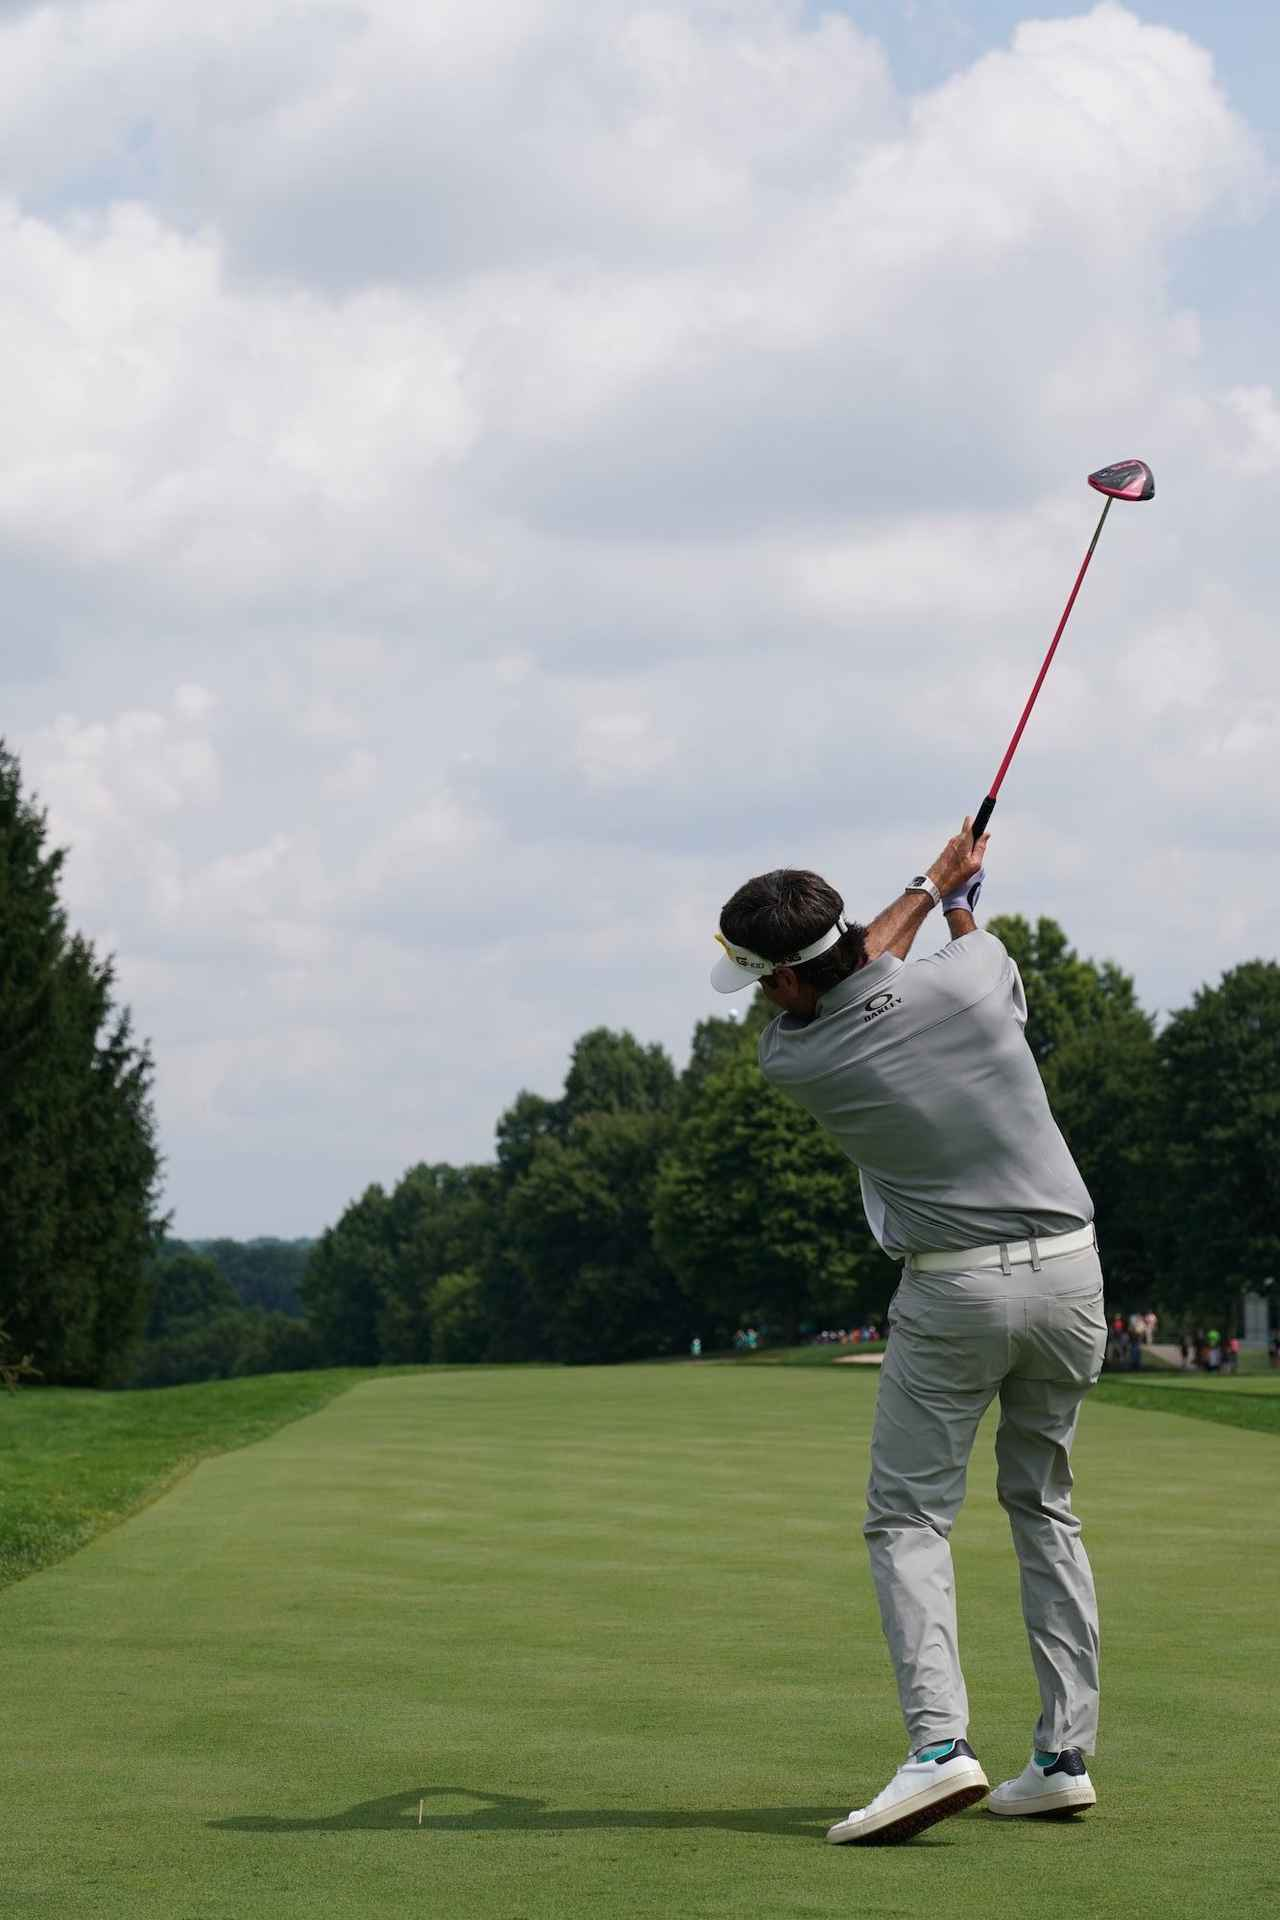 Images : 19番目の画像 - 強烈! バッバ・ワトソンのドライバーショット - みんなのゴルフダイジェスト